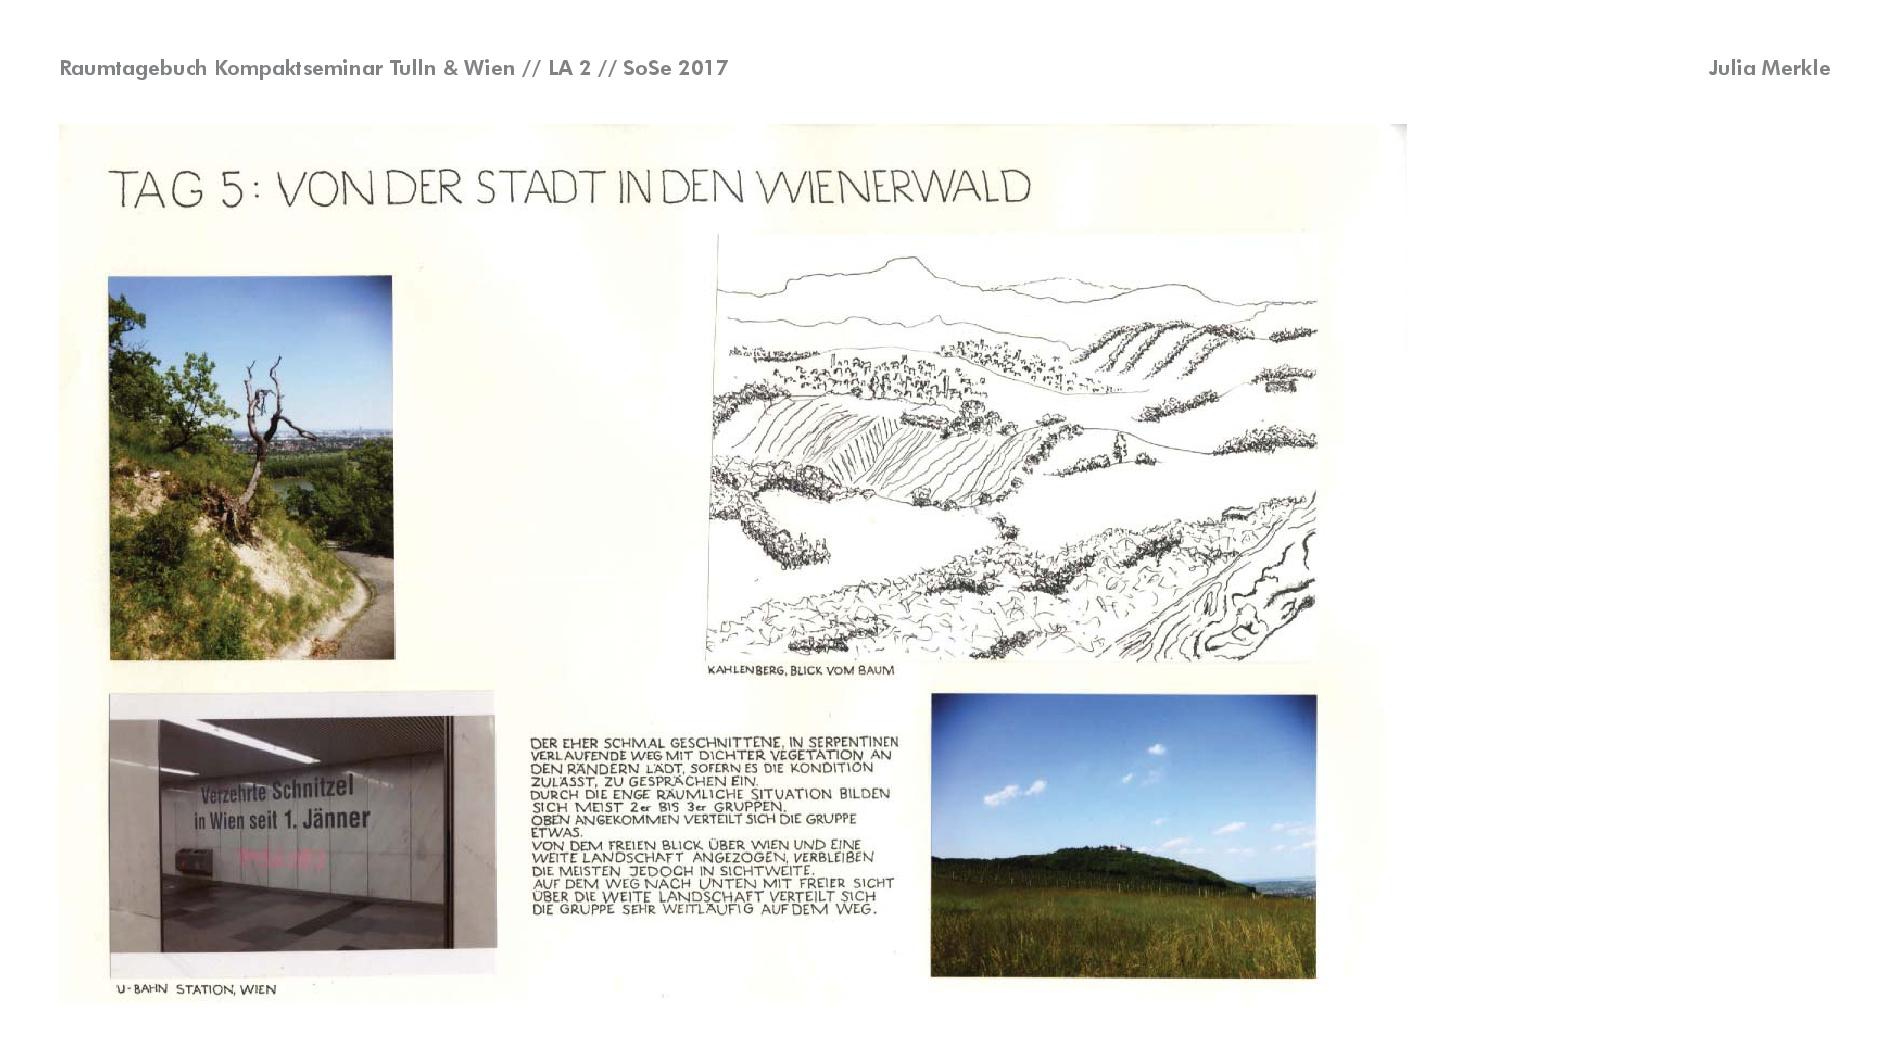 NEU Screen Raumtagebuch Tulln Wien SoSe 17 026